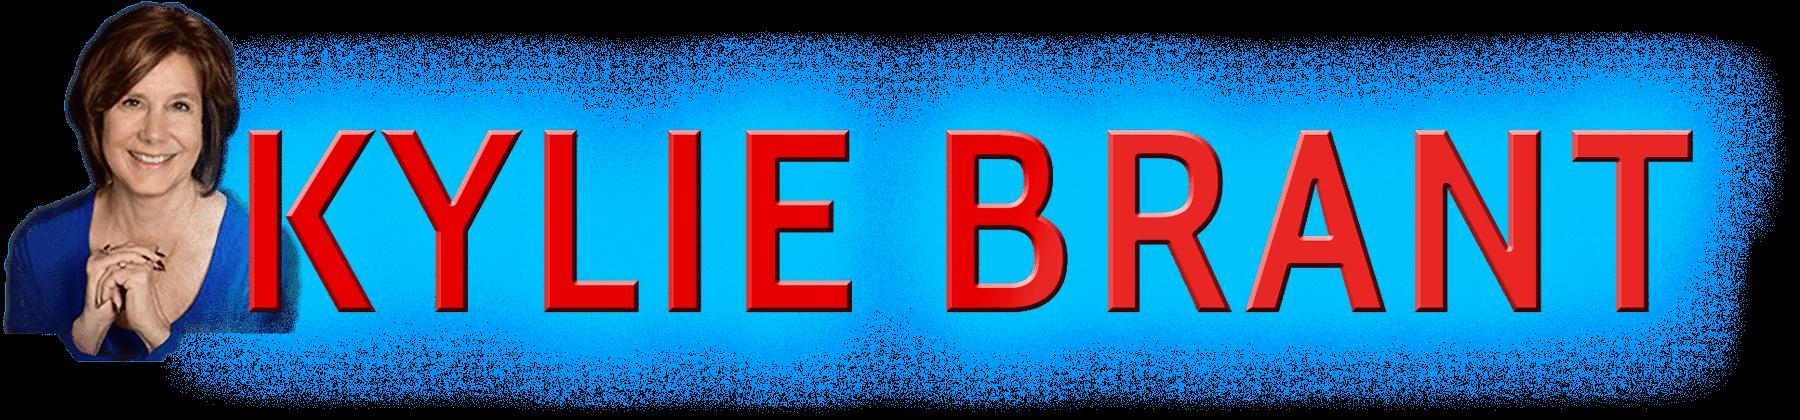 Kylie Brant — Logo